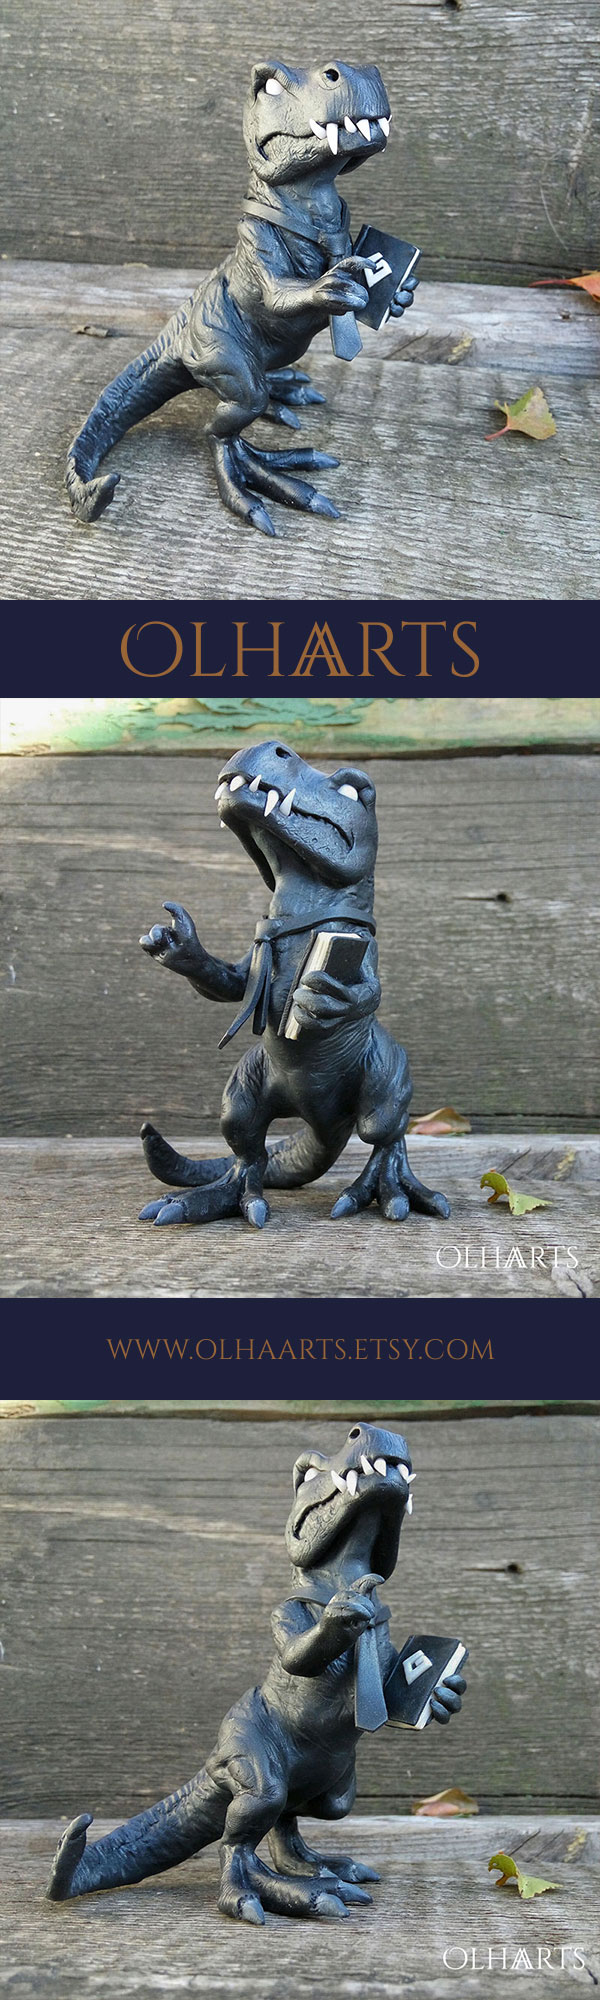 Lizard, gift for a friend Table figurine, made of polymer clay. #OlhaARTS, #polymerclay, #polymer, #handmade, #dinosaur, #lizard, #souvenir, #OOAK #полимернаяглина, #ручнаяработа, #ящер, #динозавр, #сувенир